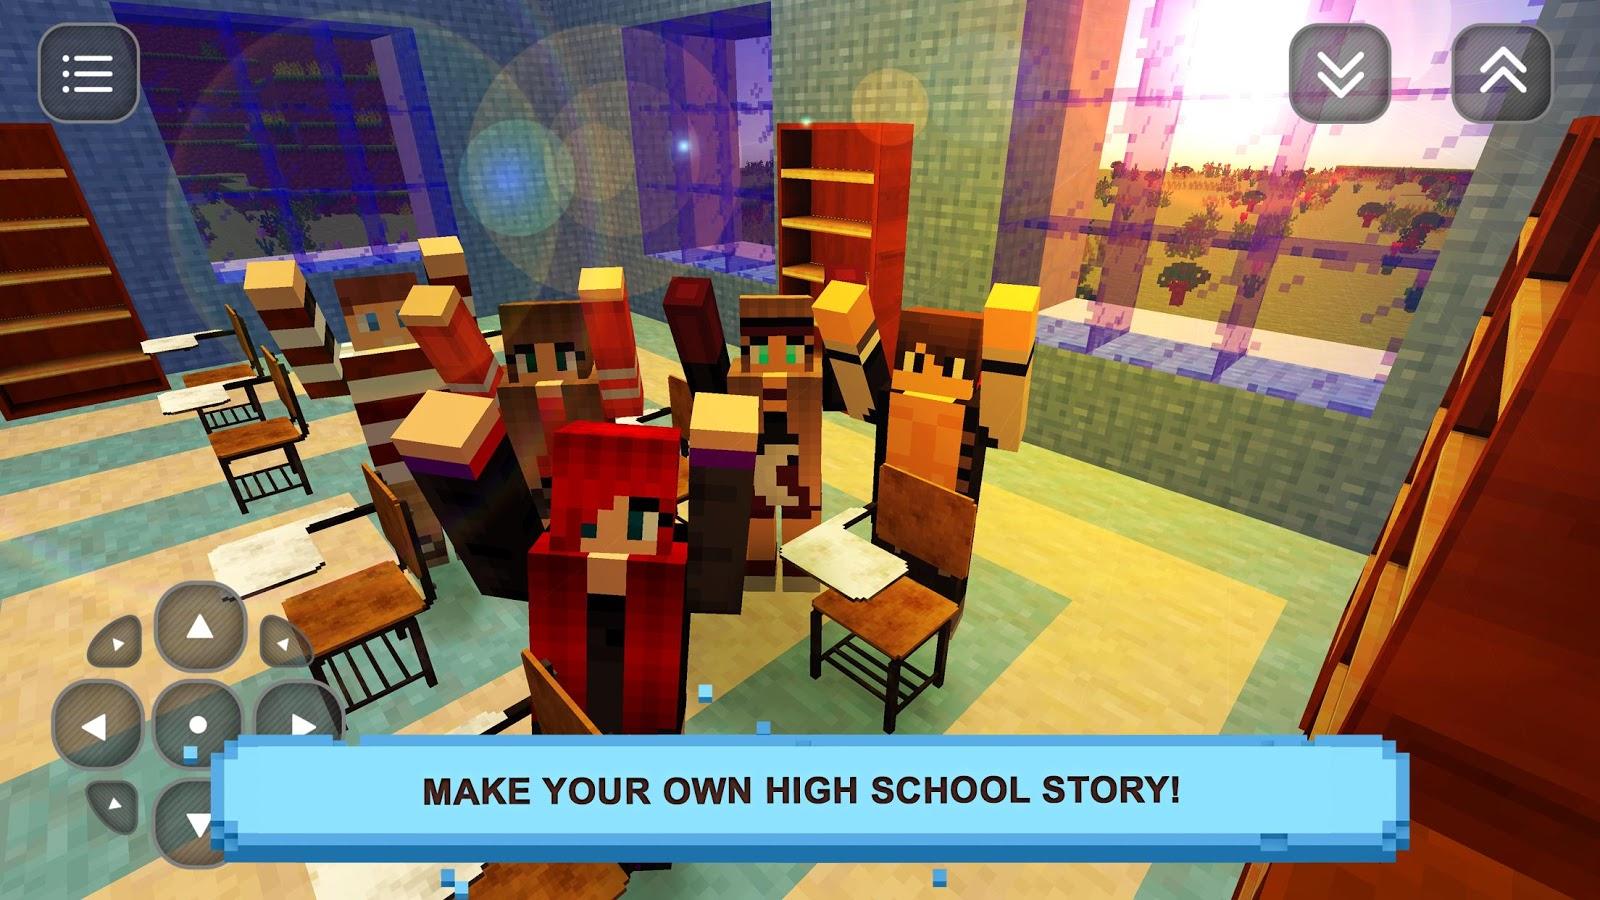 Crafts for highschool students - High School Girls Craft Story Screenshot